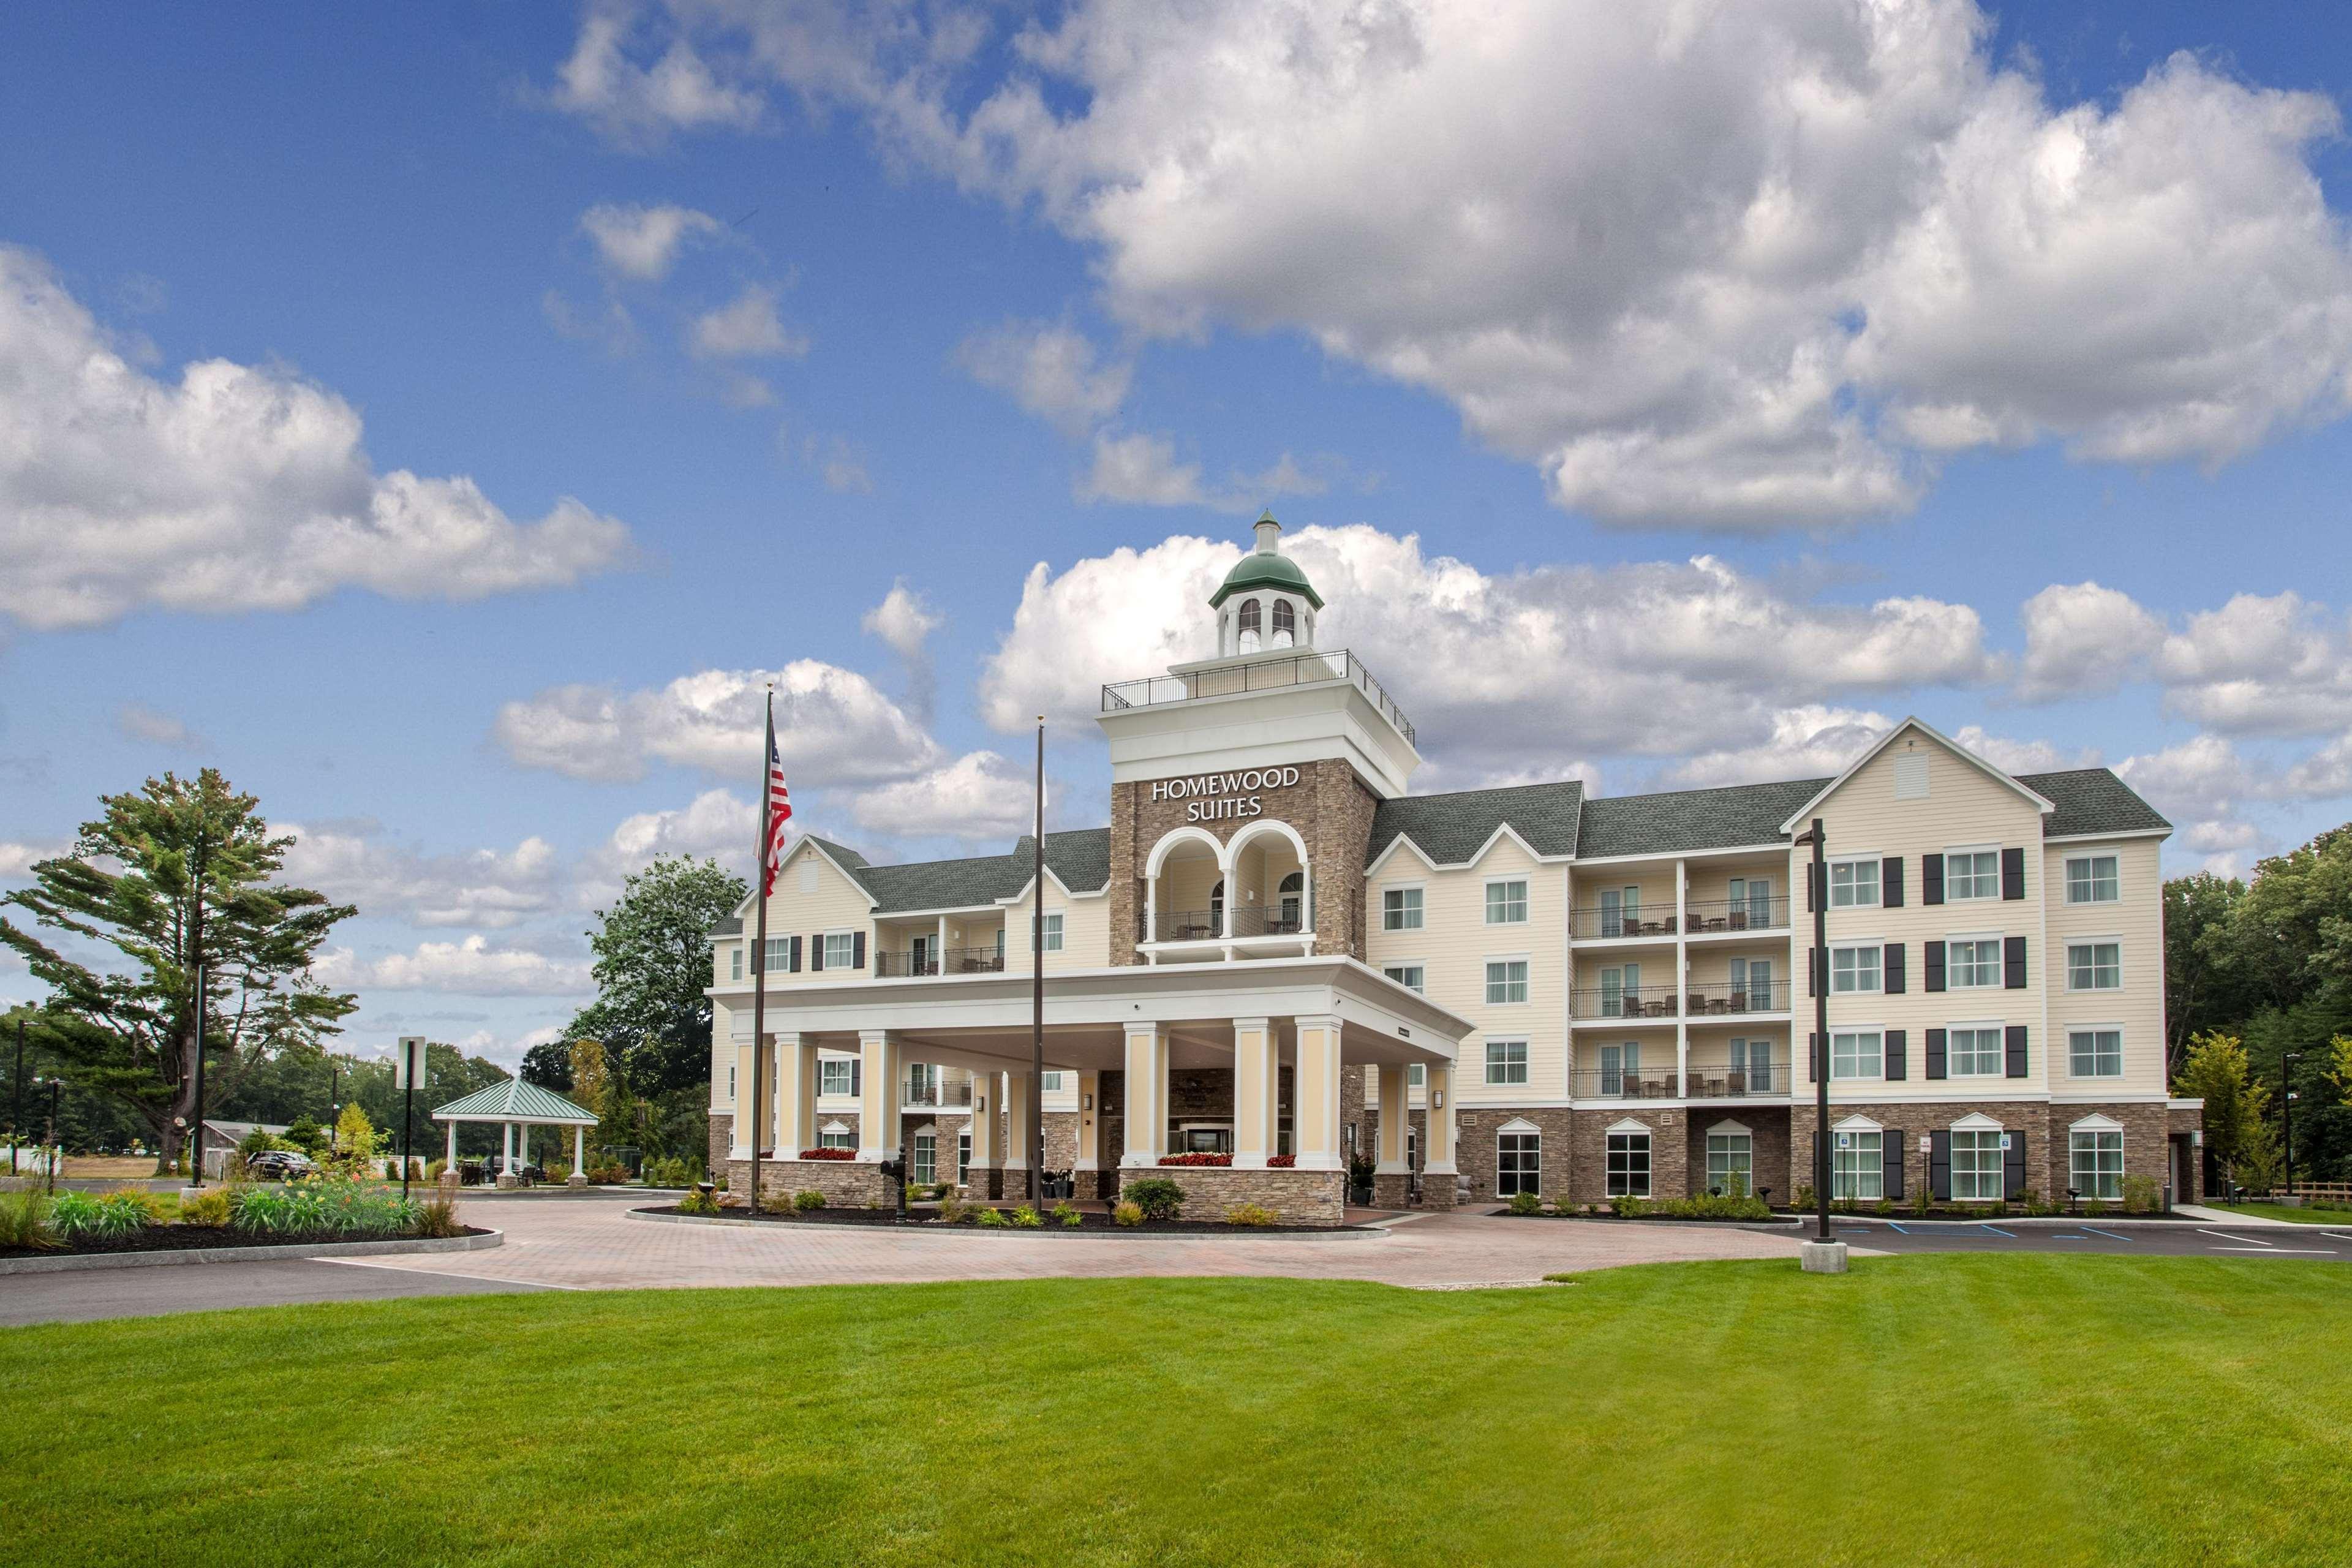 Homewood Suites by Hilton Saratoga Springs image 36